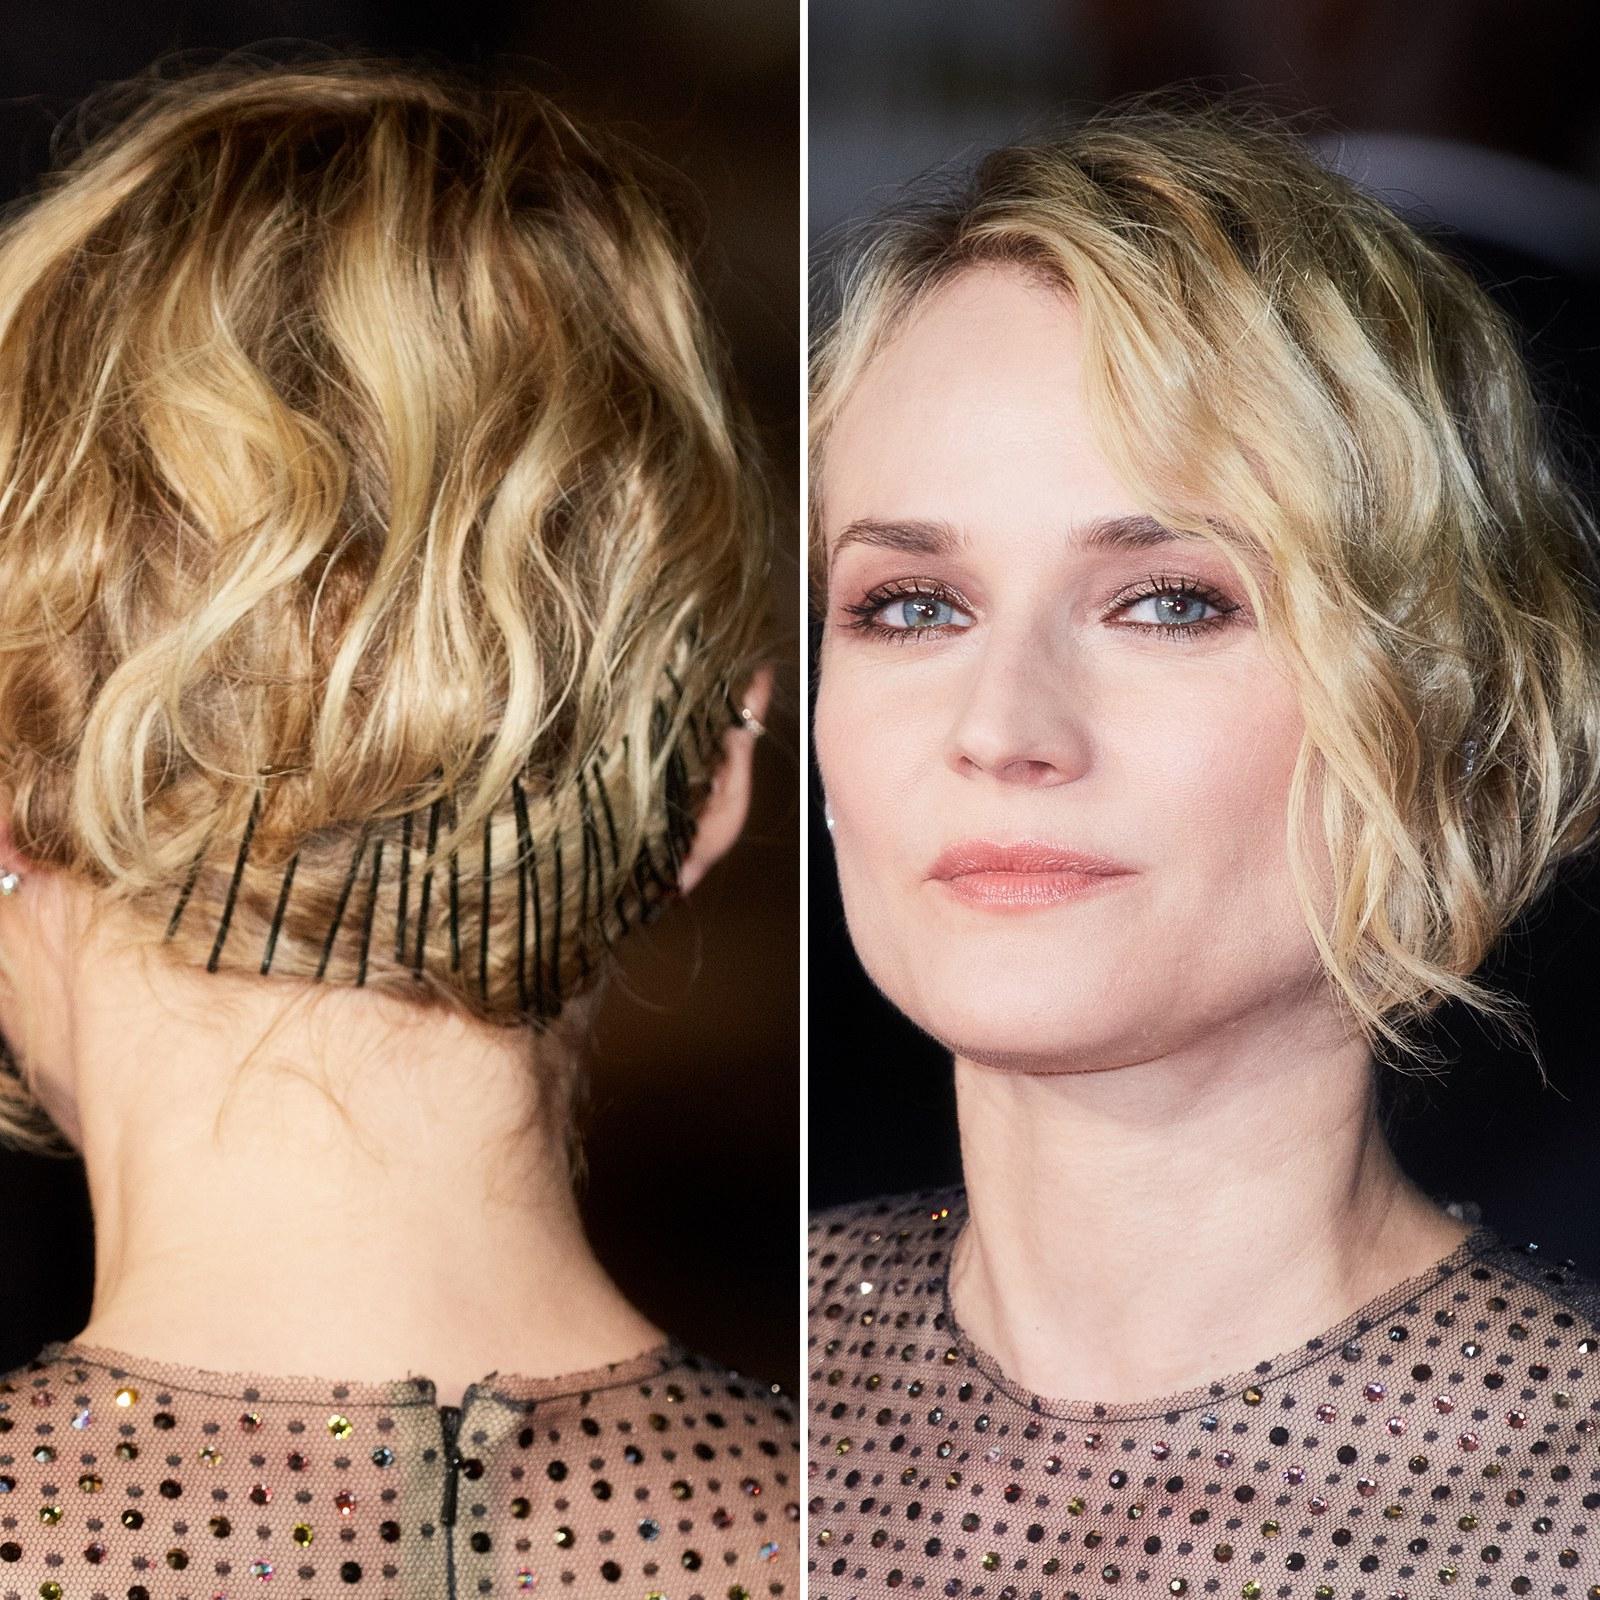 10 Wedding Hairstyle Ideas For Short Hair – Allure With Hairstyle For Short Hair For Wedding (View 15 of 25)